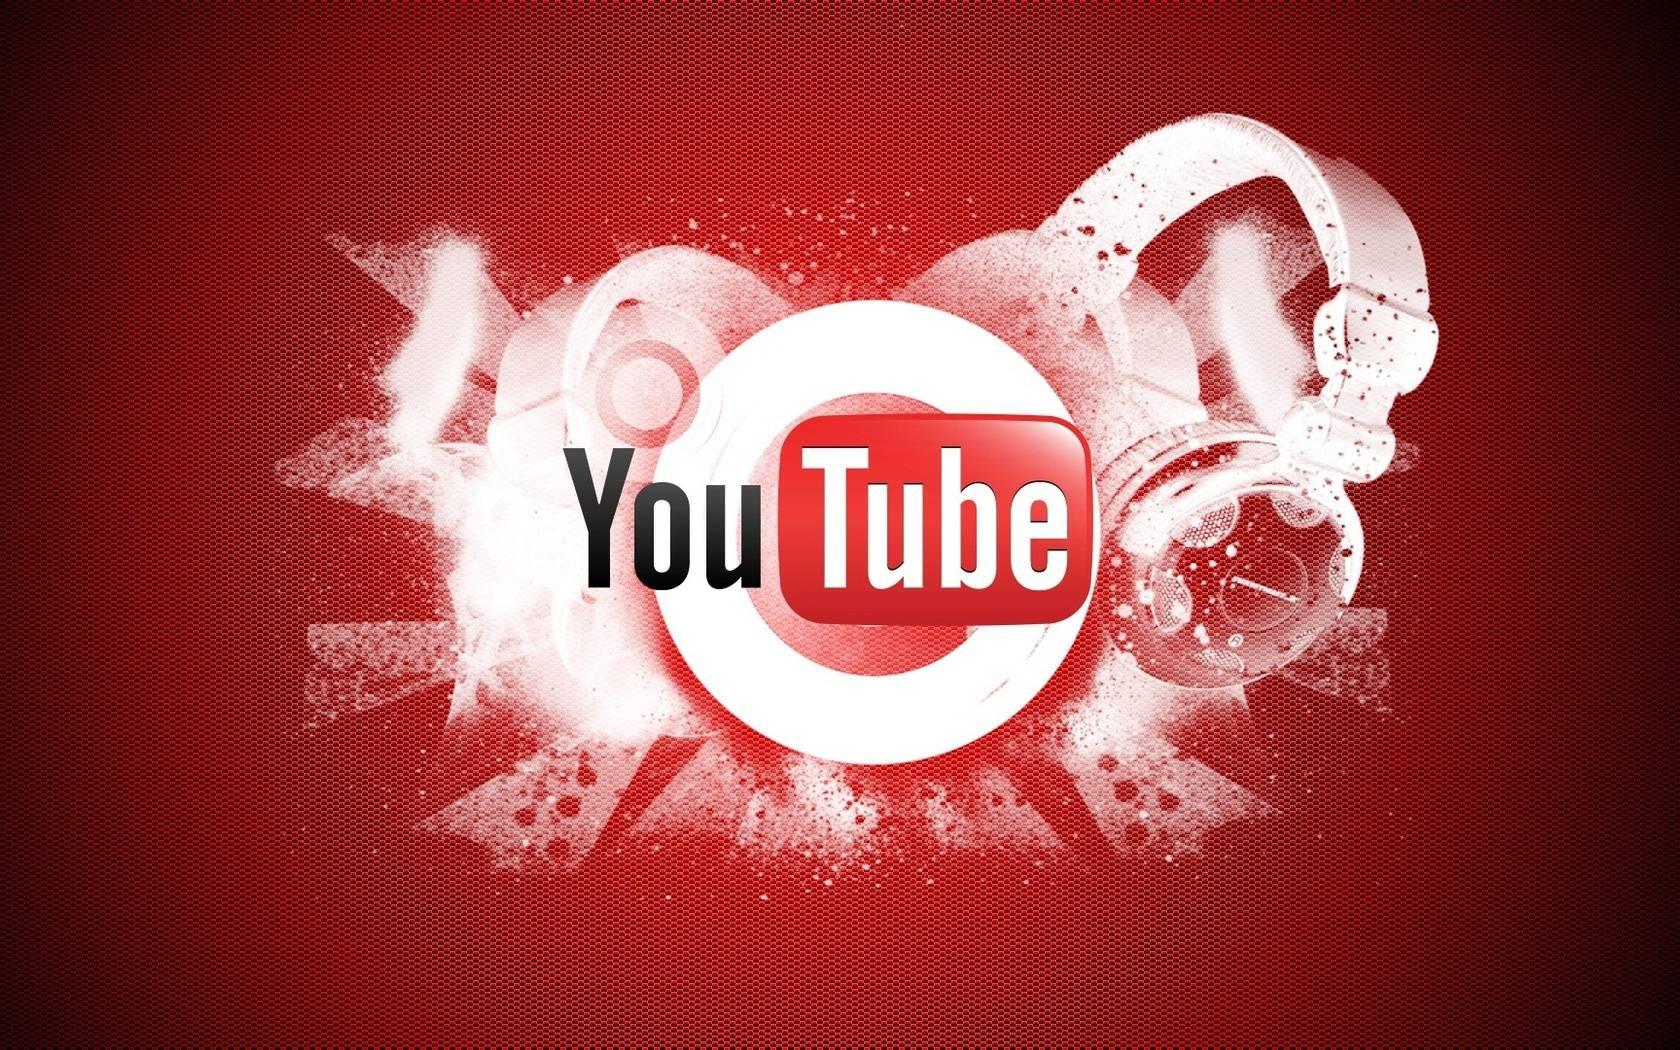 Cool Youtube Wallpaper2 Youtube desktop wallpaper 1680x1050